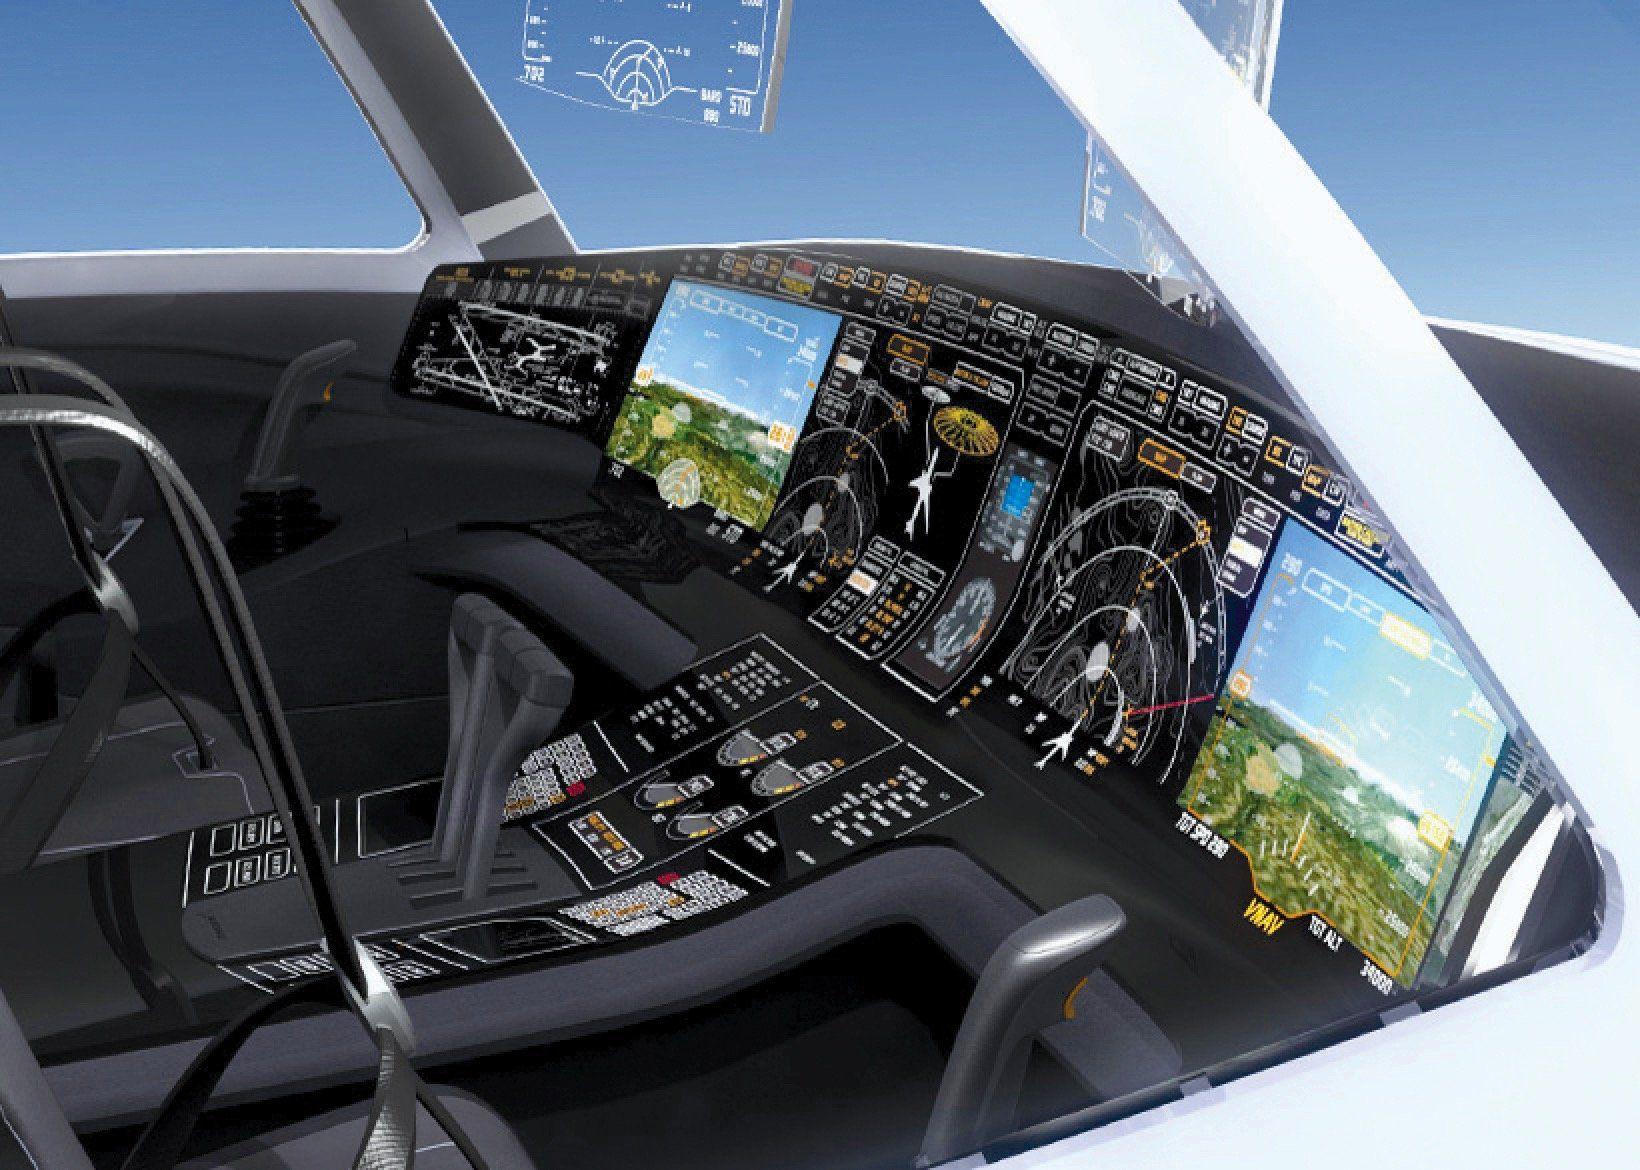 CockpitProcessed